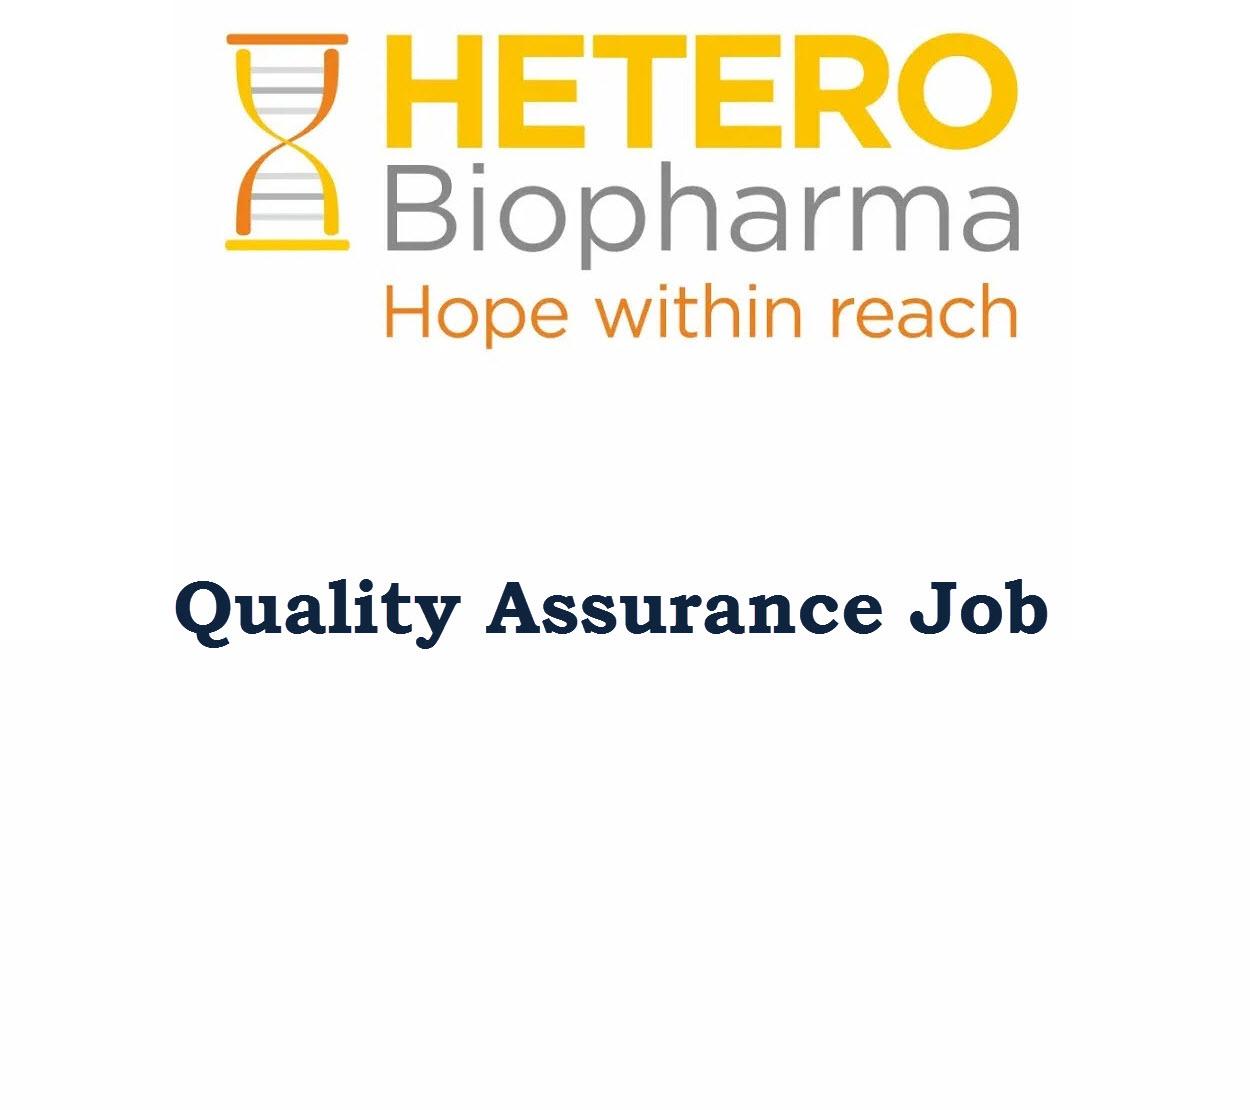 Quality Assurance Job at Hetero Biopharma